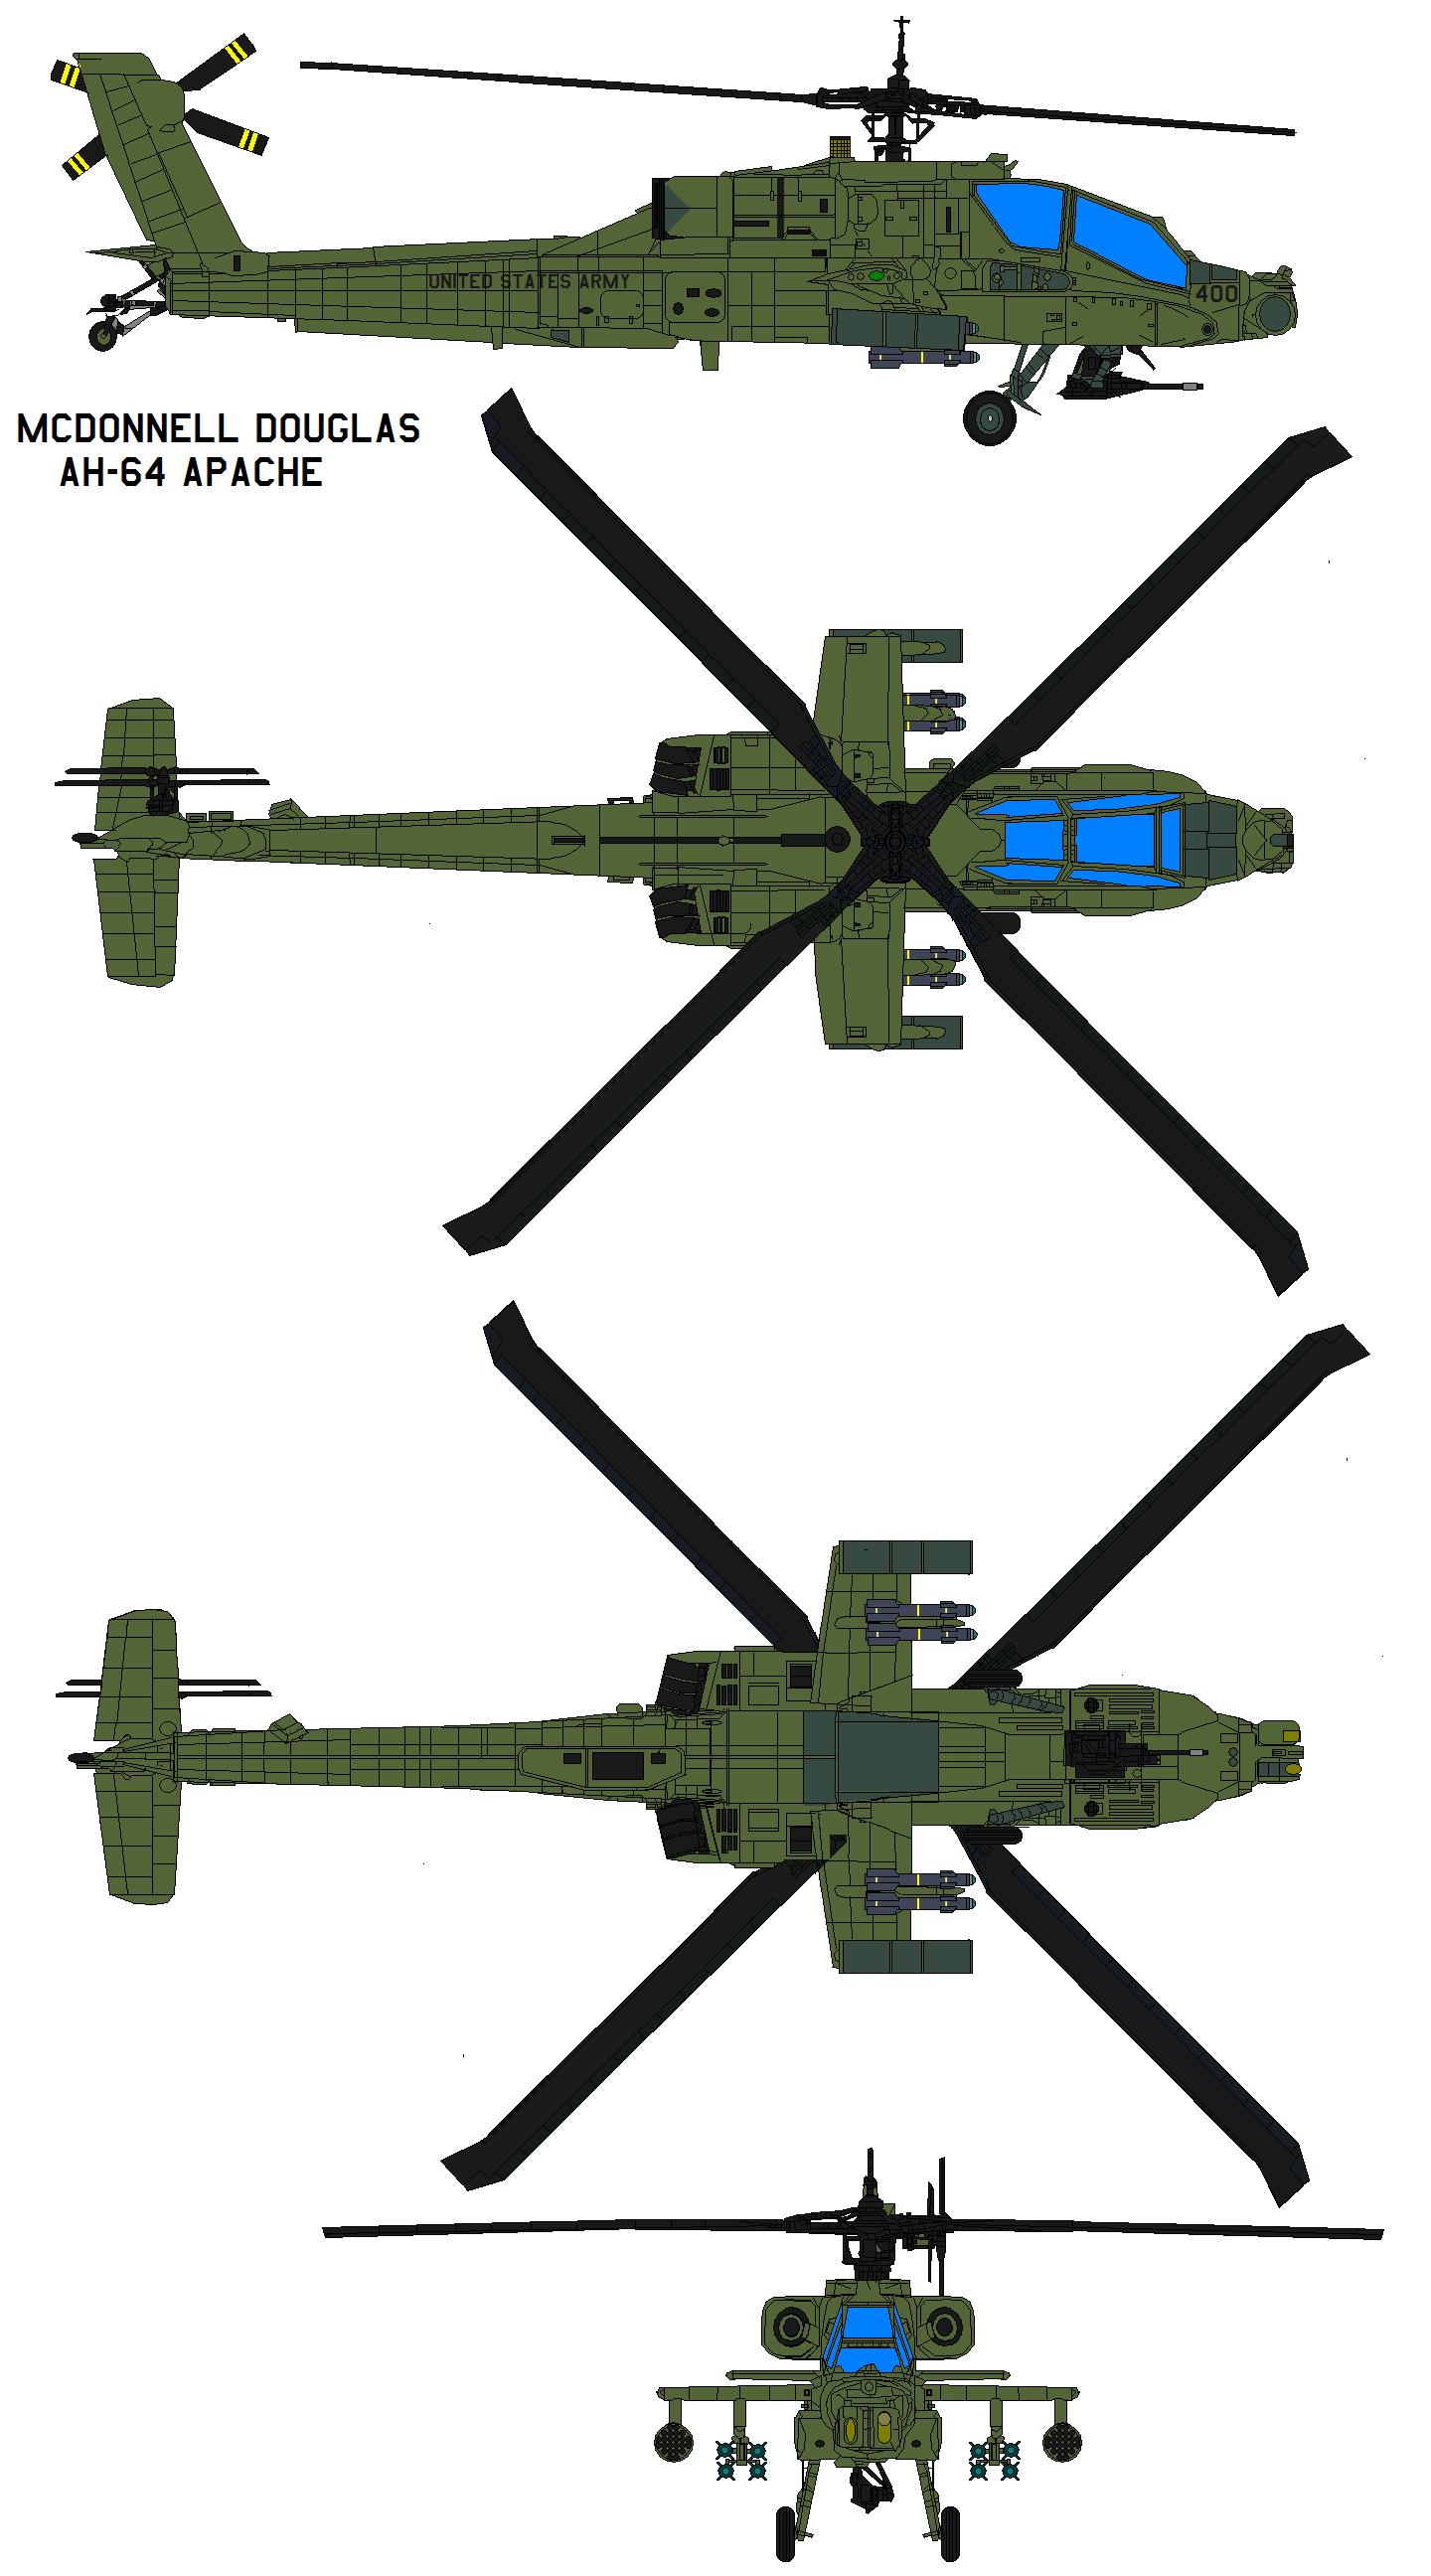 McDonnell Douglas AH-64 APACHE by bagera3005